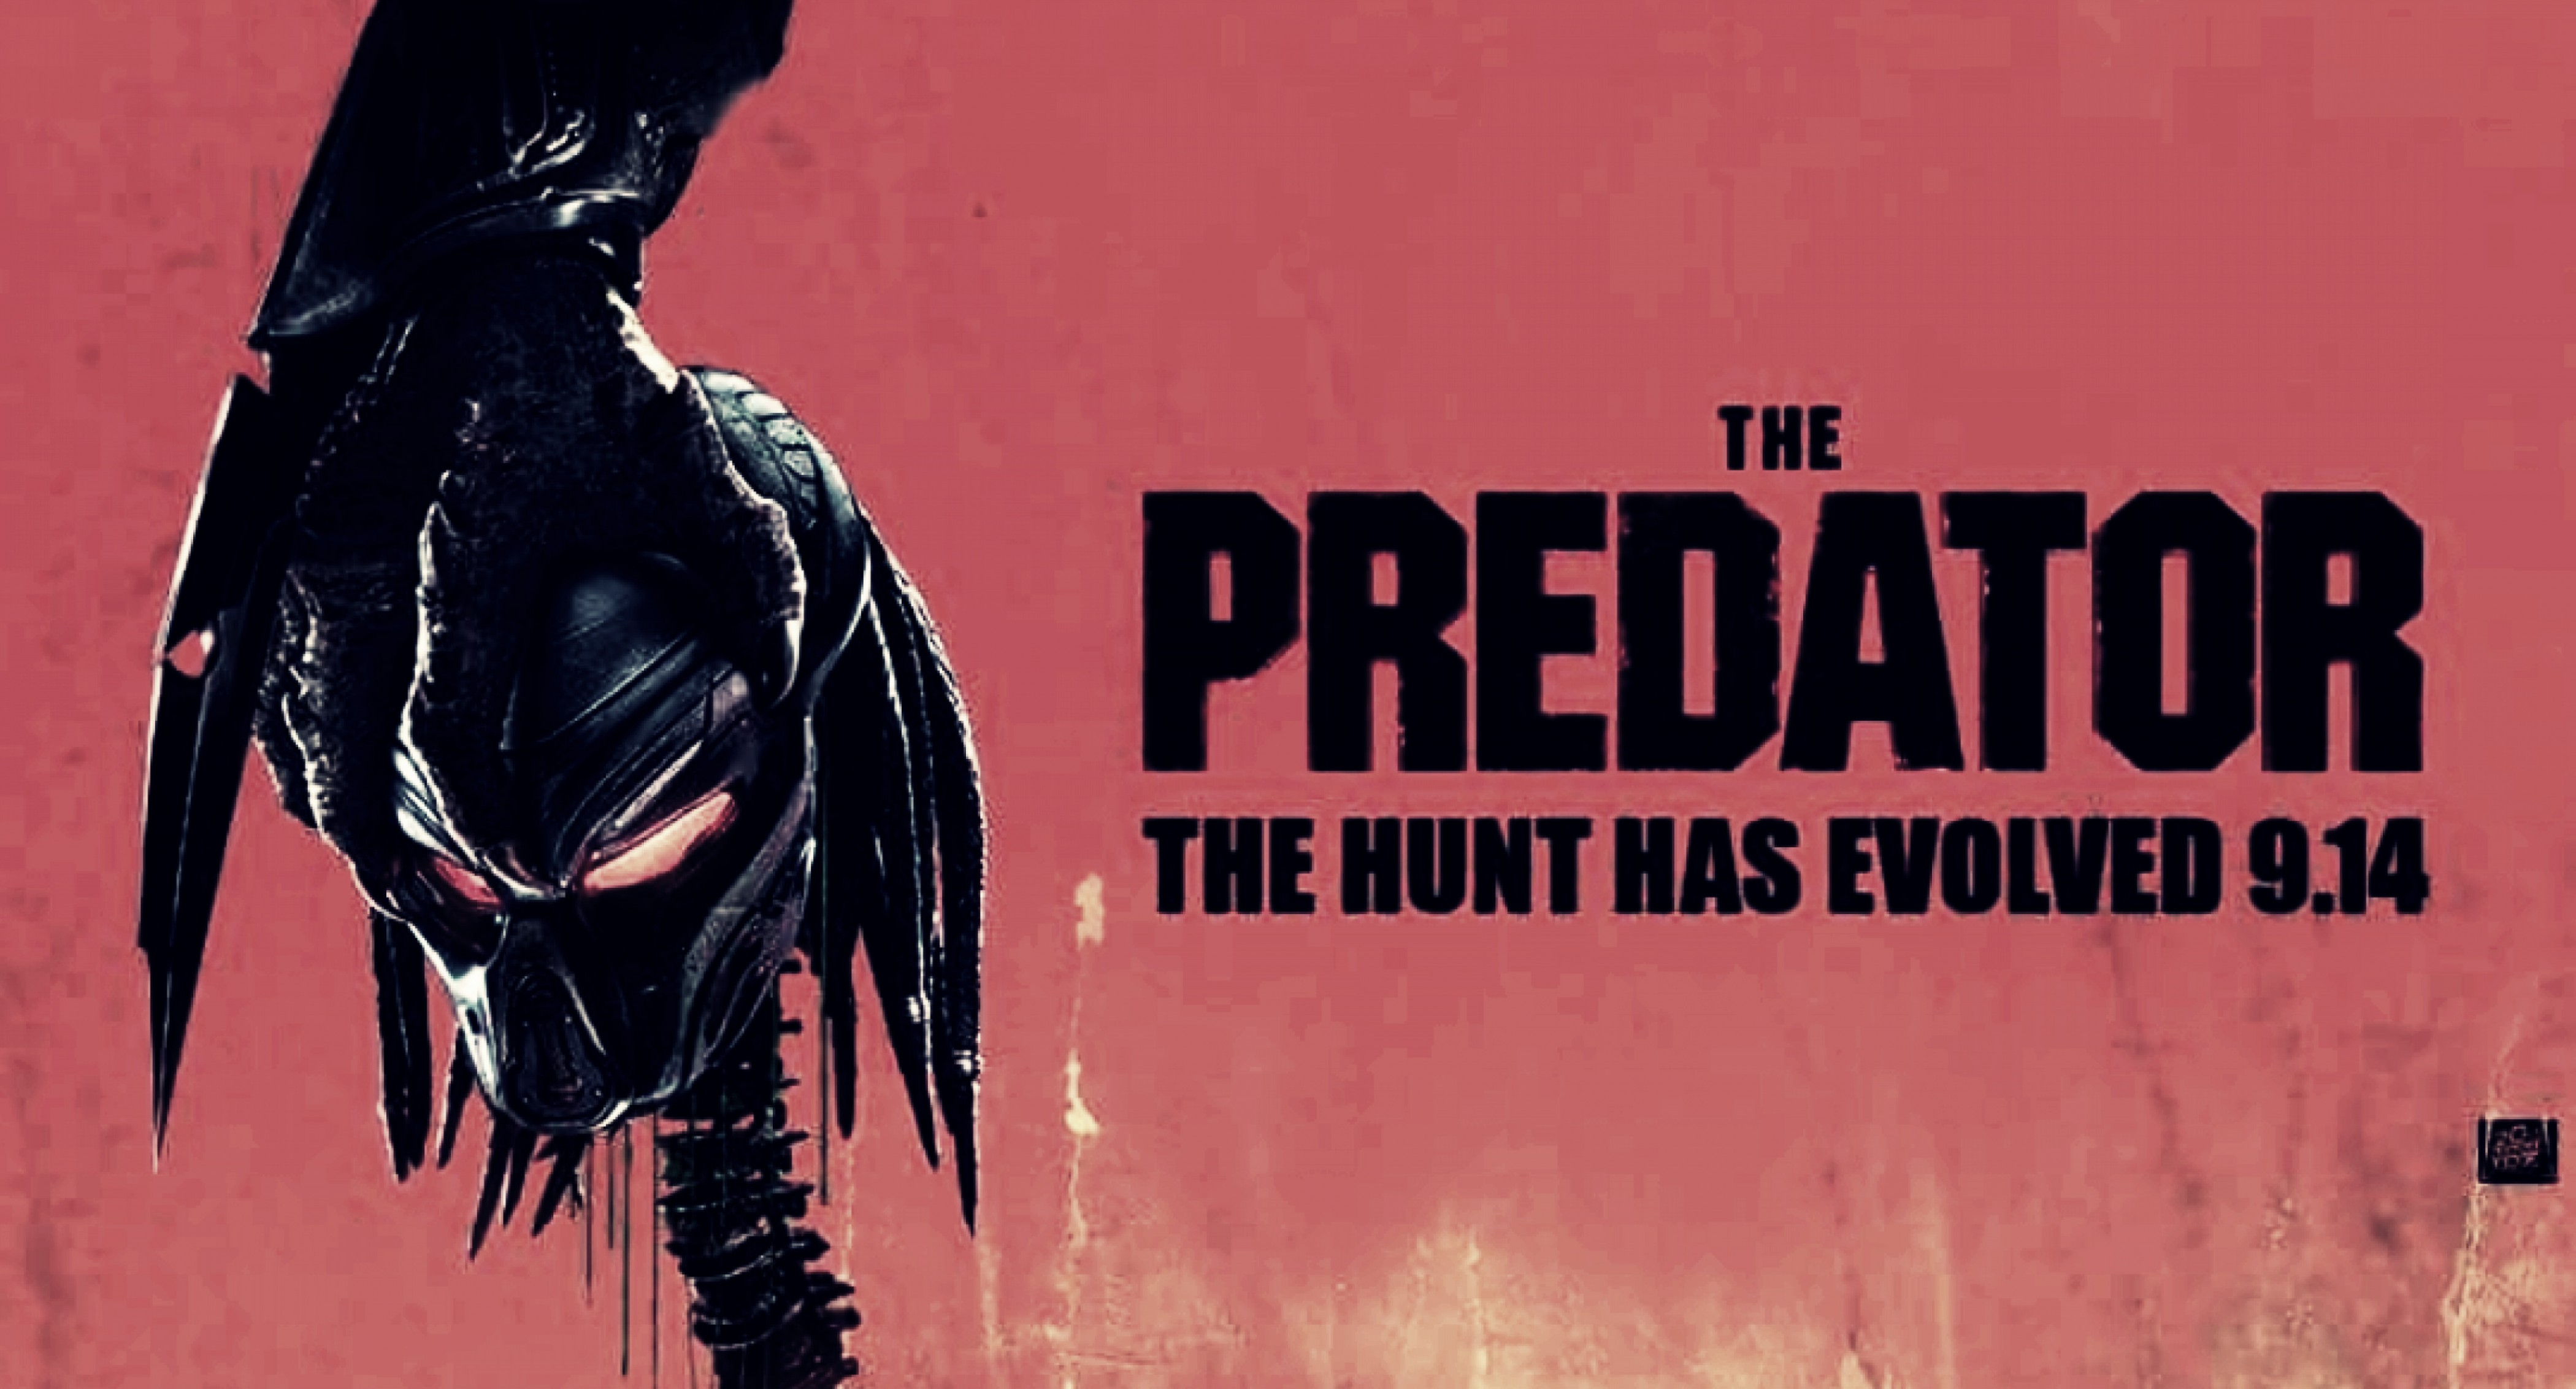 CRÍTICA | O Predador